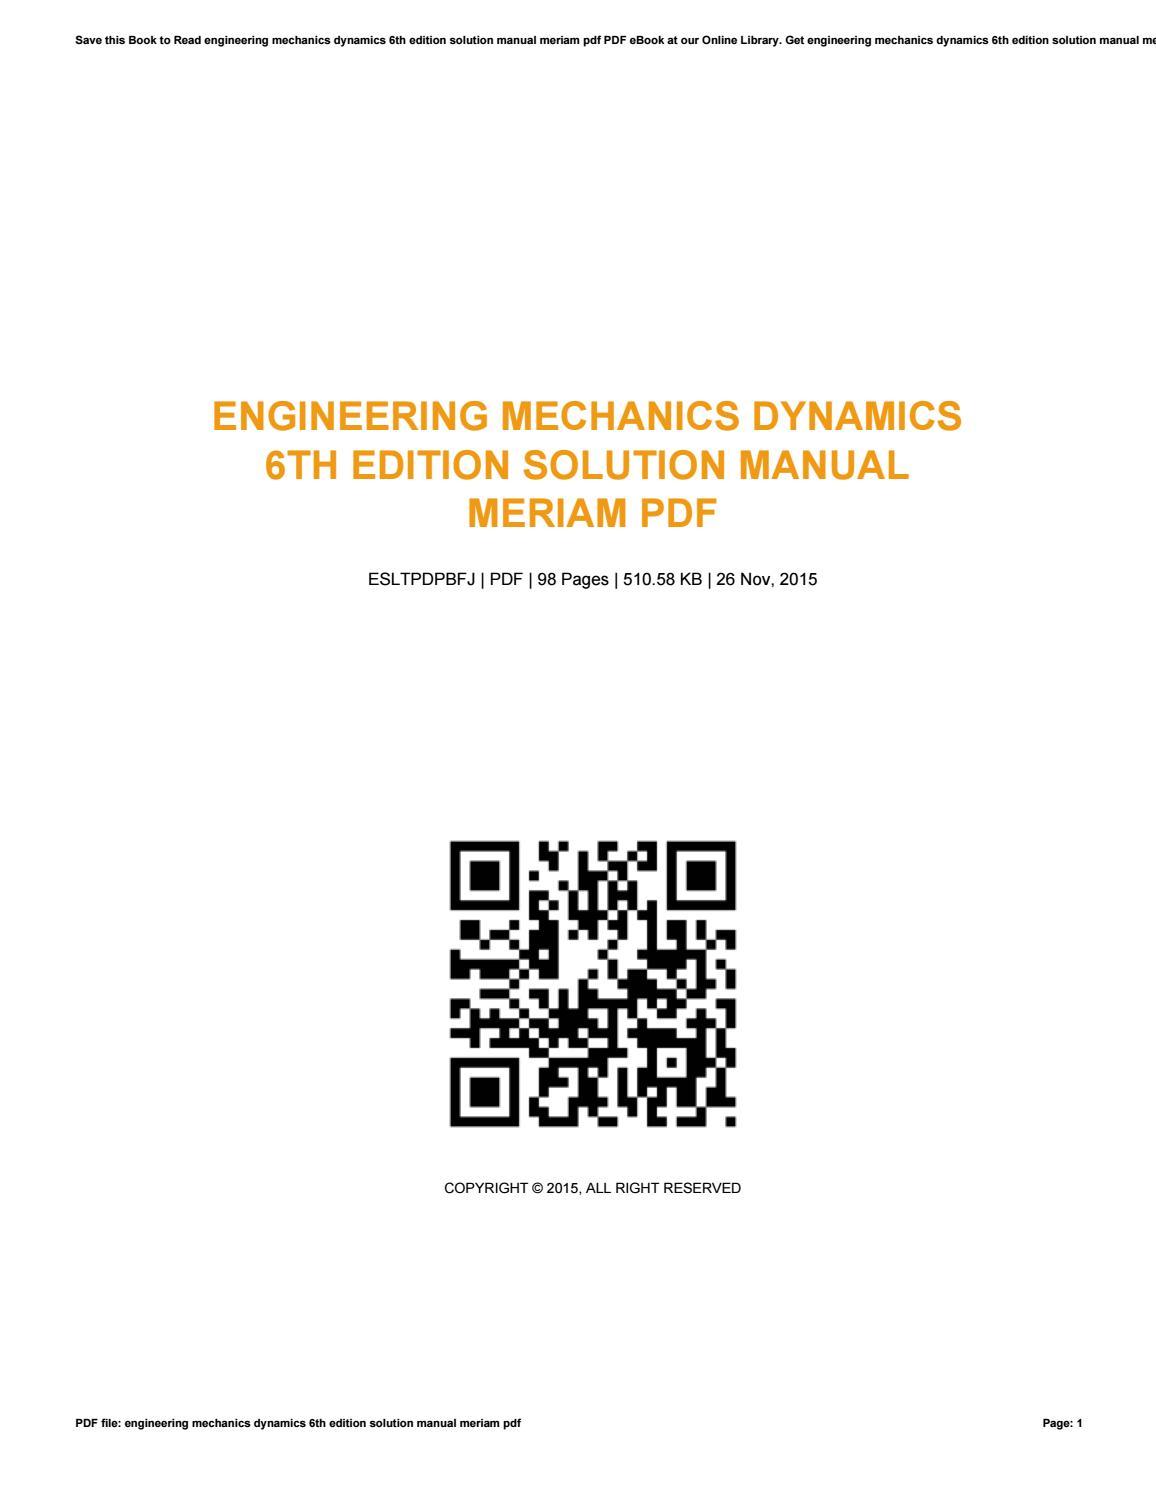 Engineering mechanics-dynamics-7th-editi.